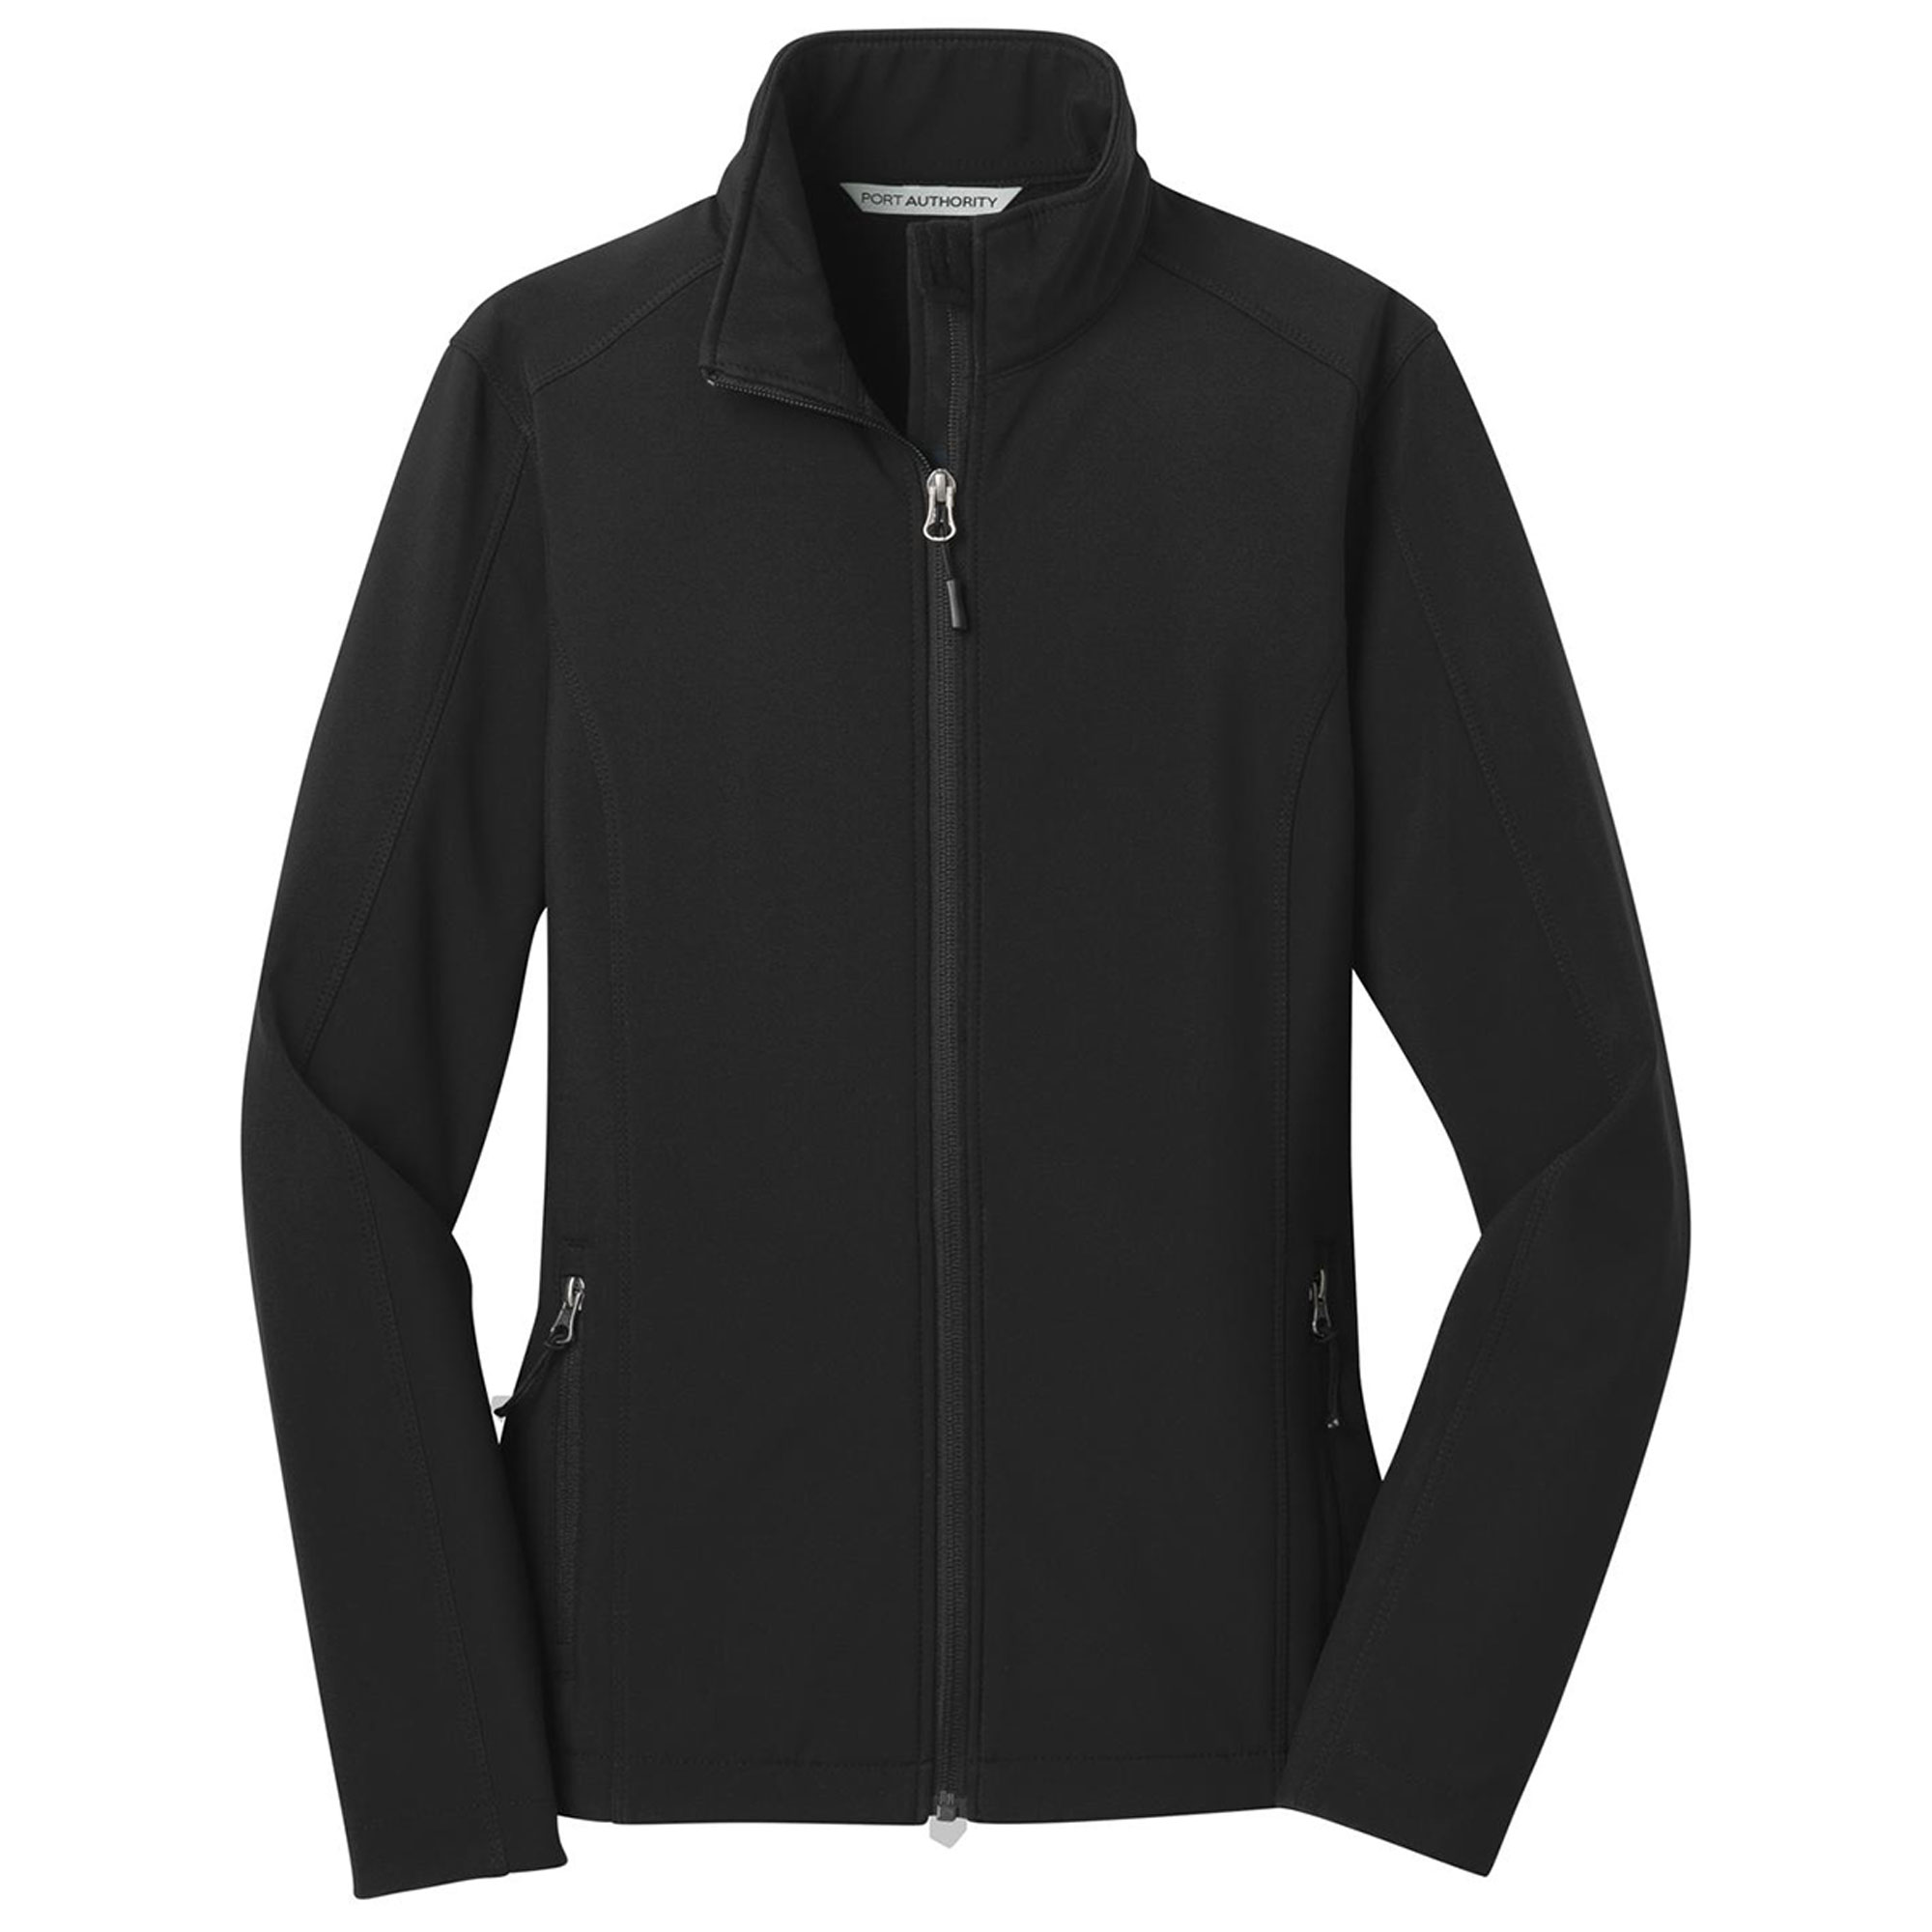 Port Authority Women's Waterproof Core Soft Shell Jacket